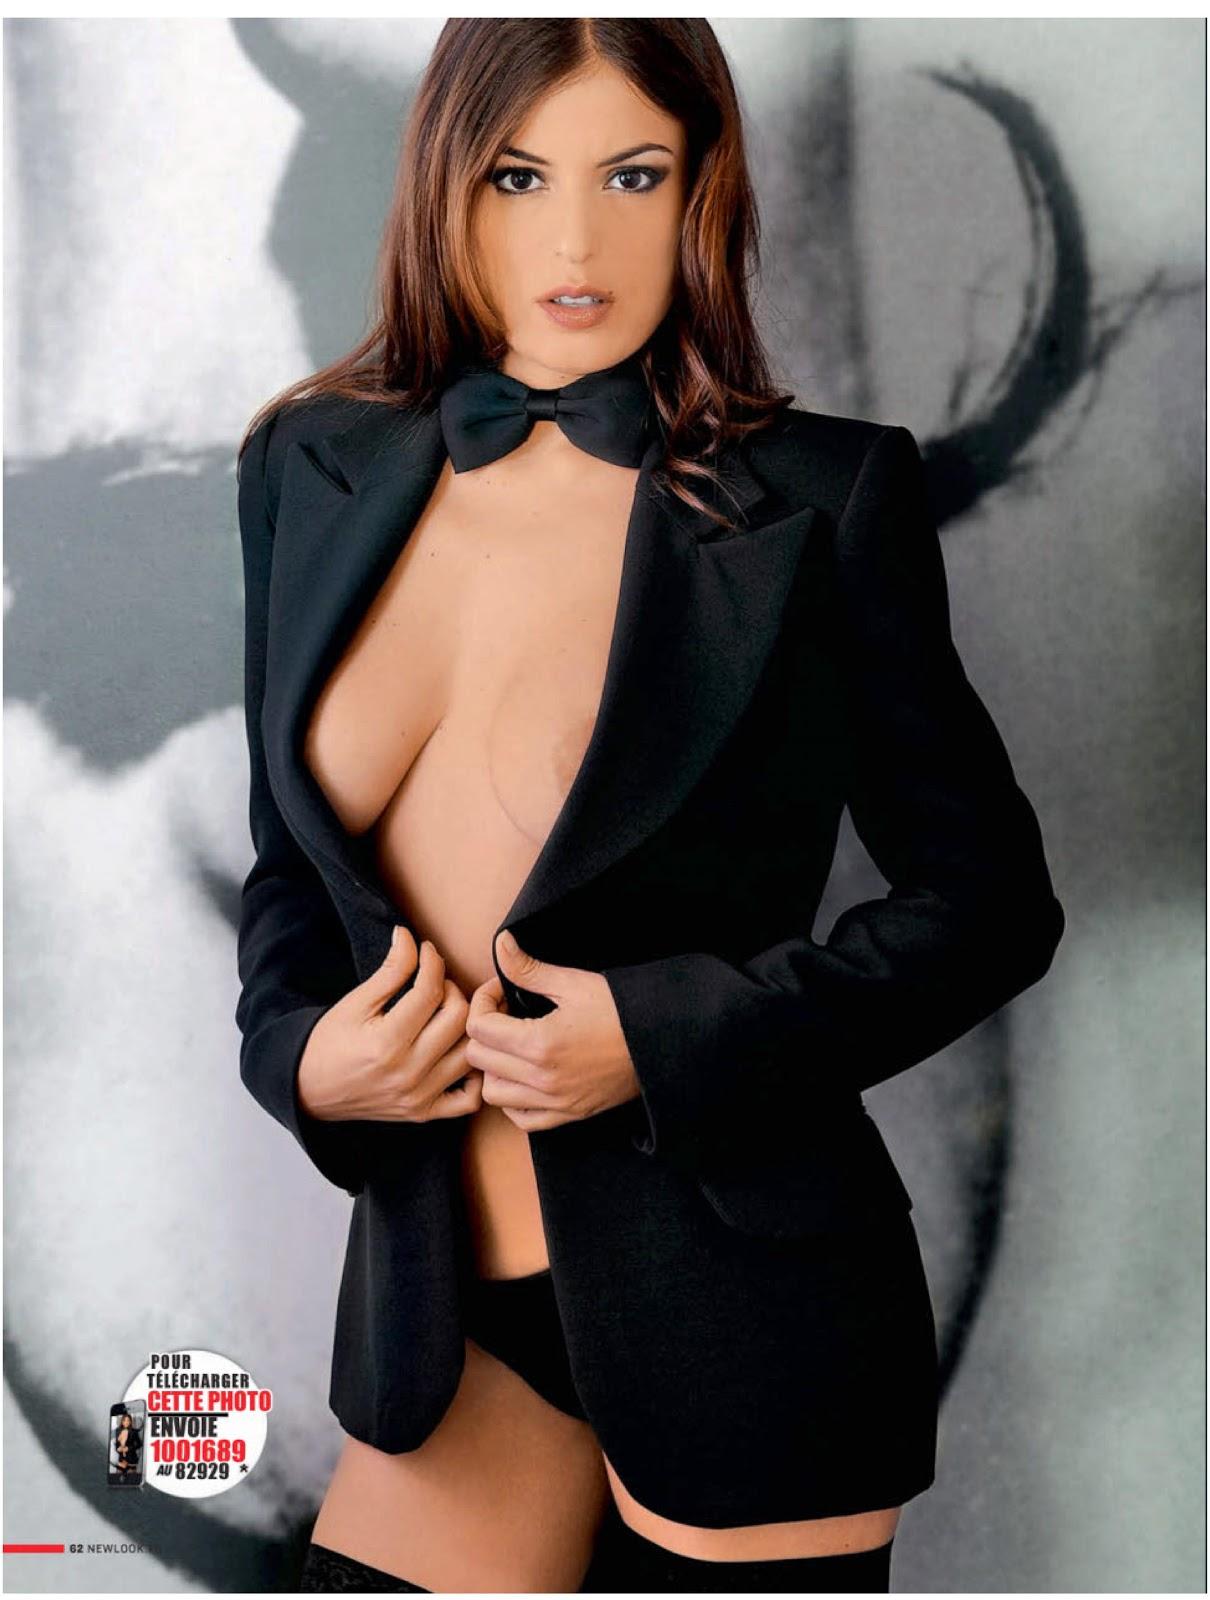 sara tommasi italian hot and beautiful women of the world